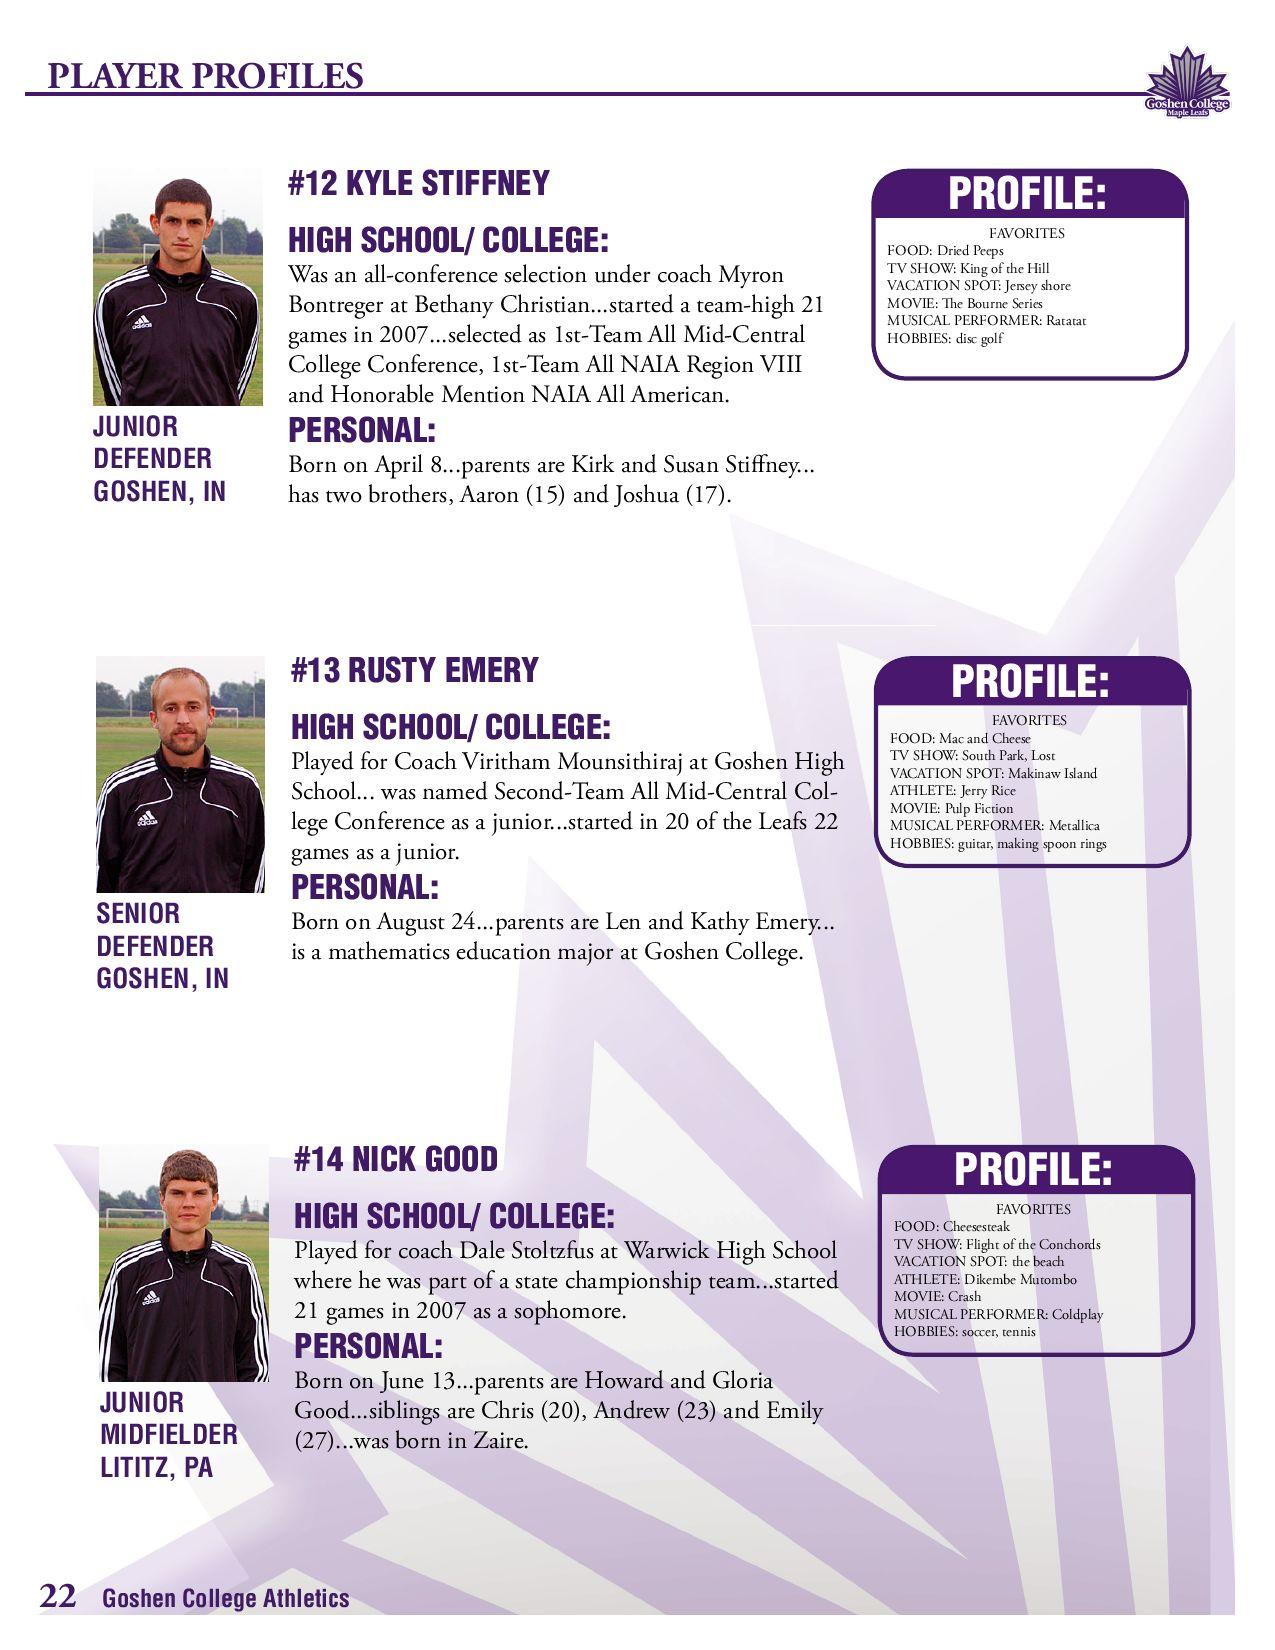 2008 Goshen College Men's Soccer Media Guide